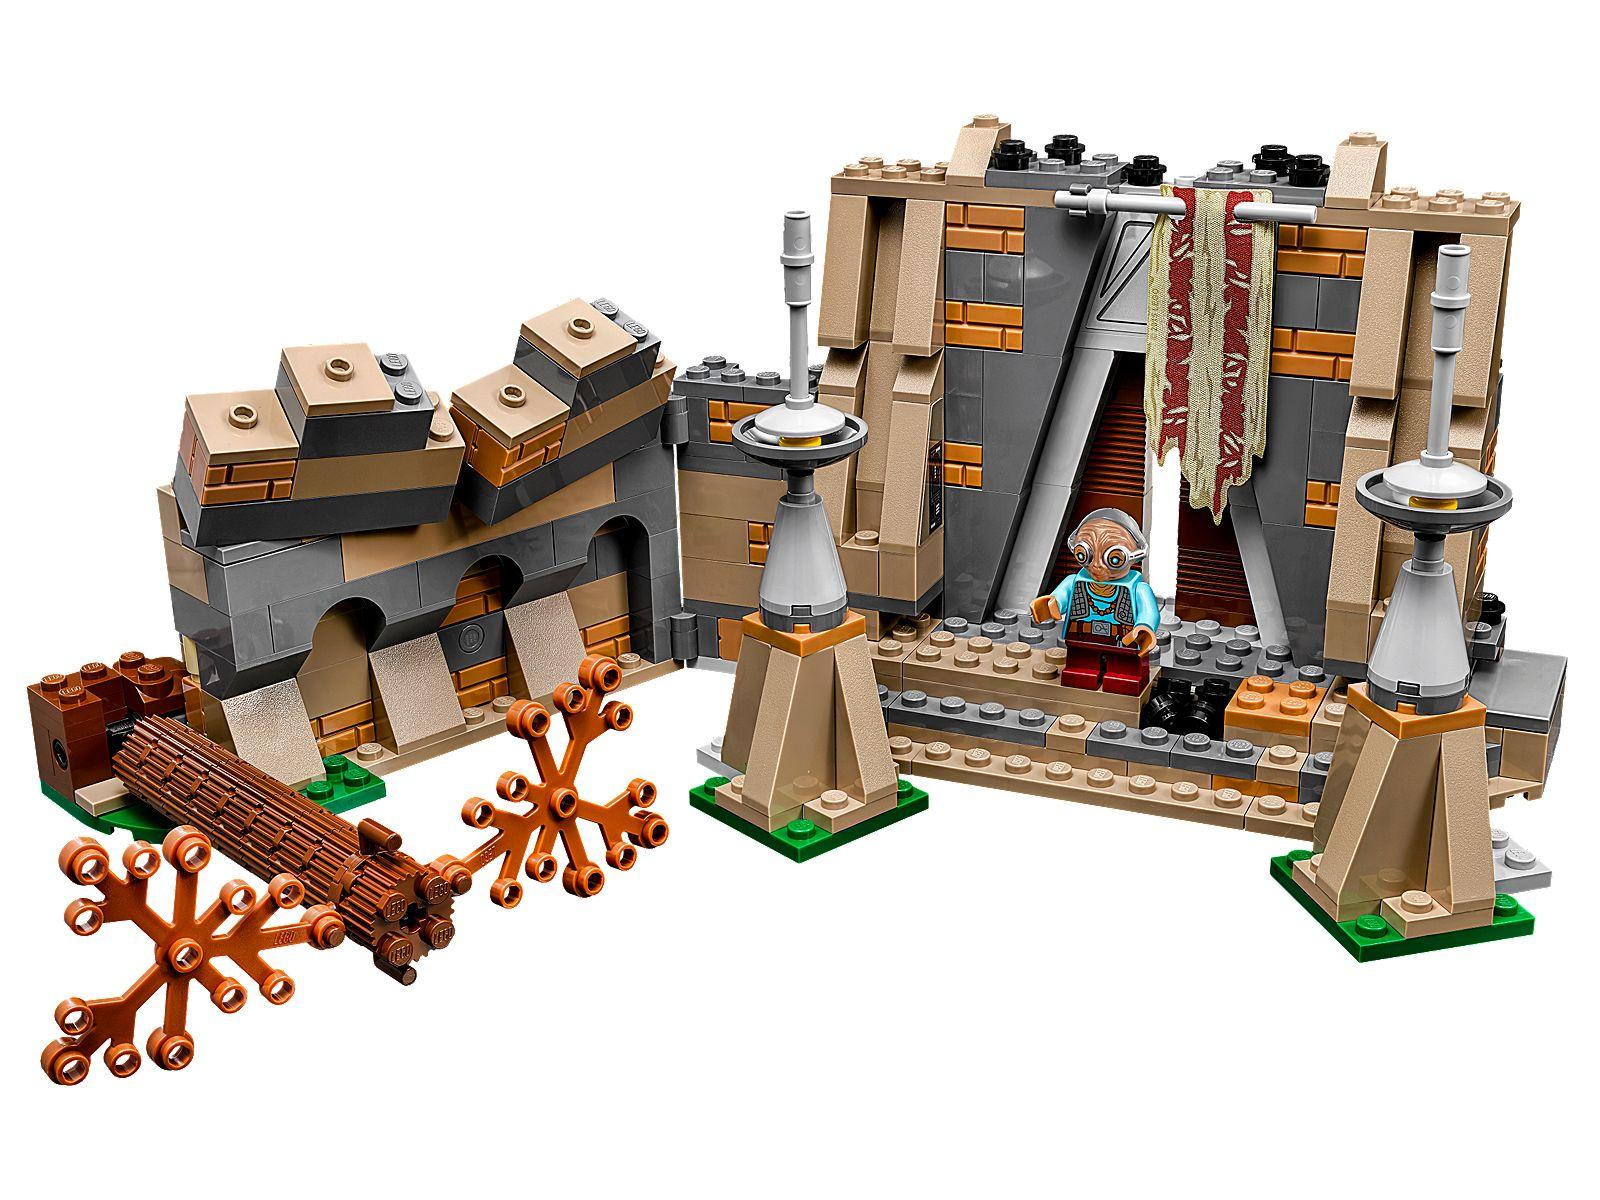 lego star wars tfa and others 75139 75126 75132 75140. Black Bedroom Furniture Sets. Home Design Ideas